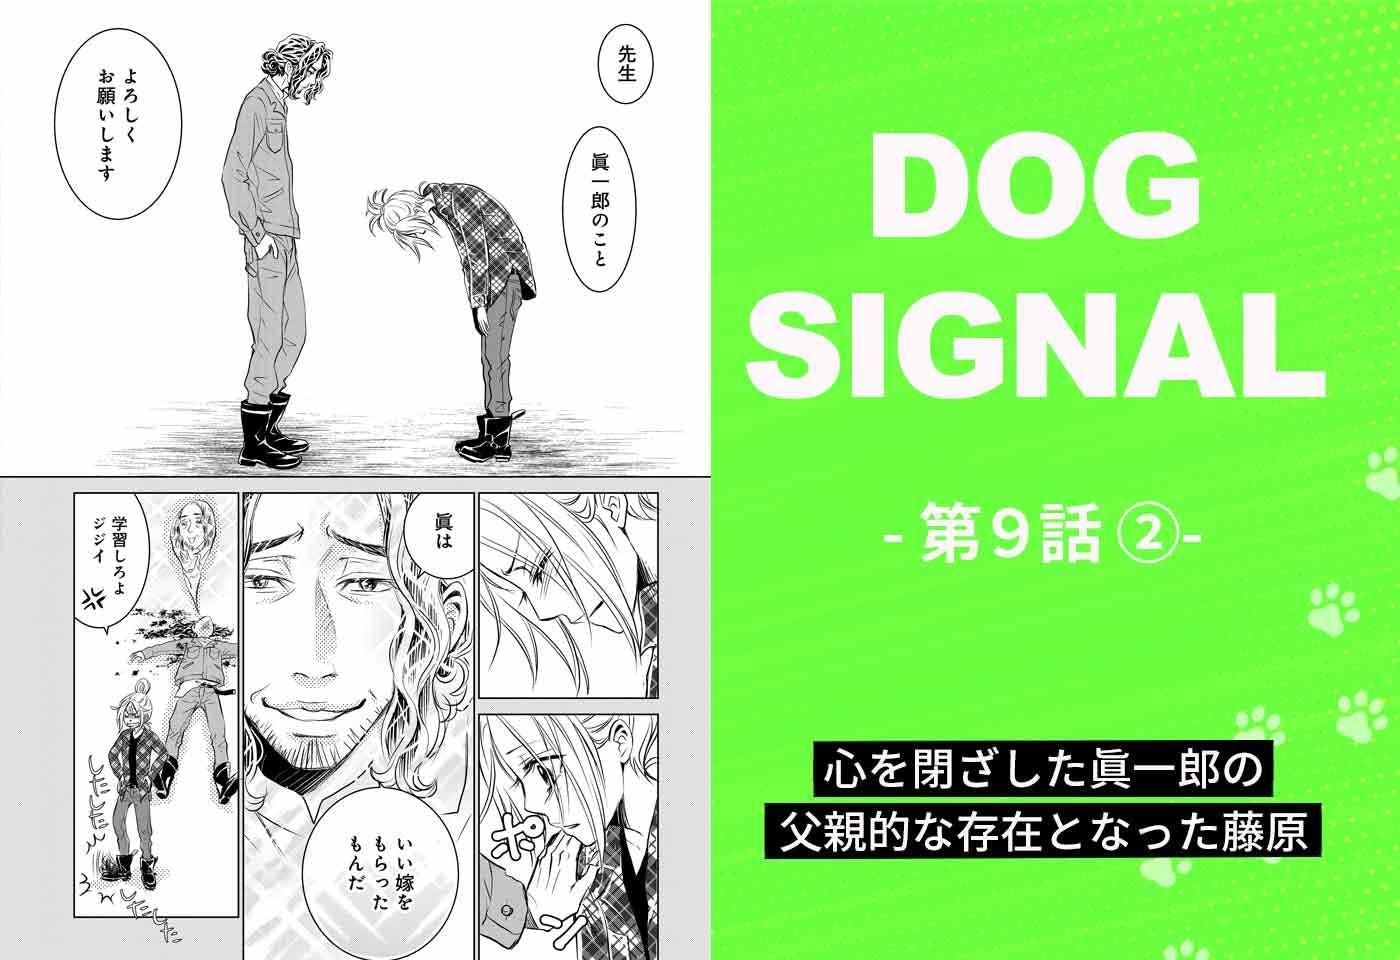 『DOG SIGNAL』9話目 2/4